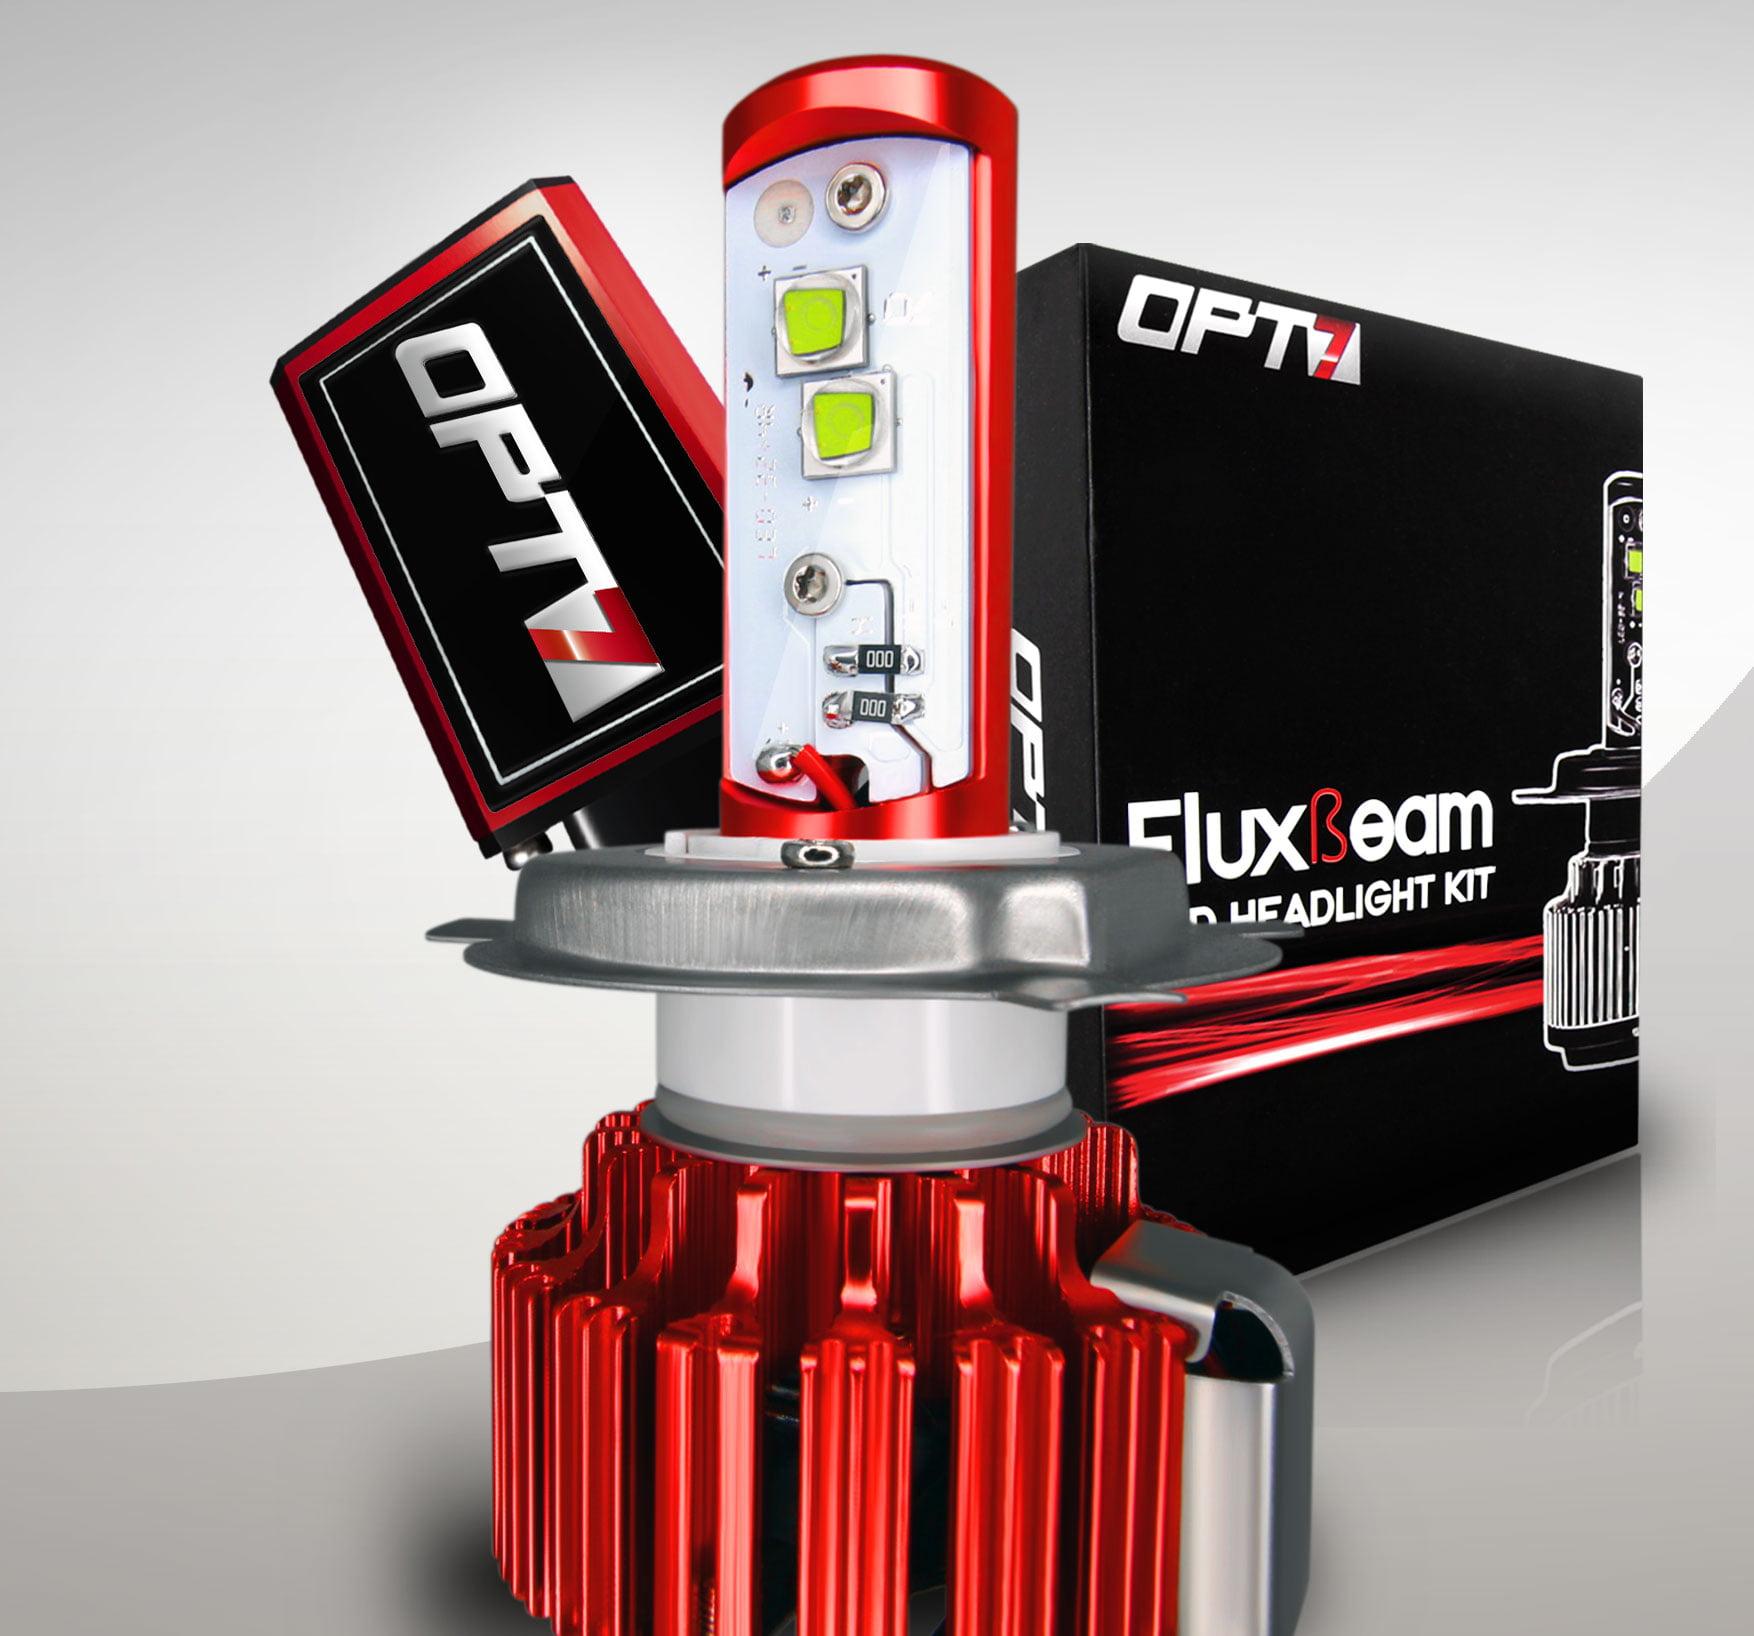 Opt7 Fluxbeam H13 Led Motorcycle Headlight Bulb Single